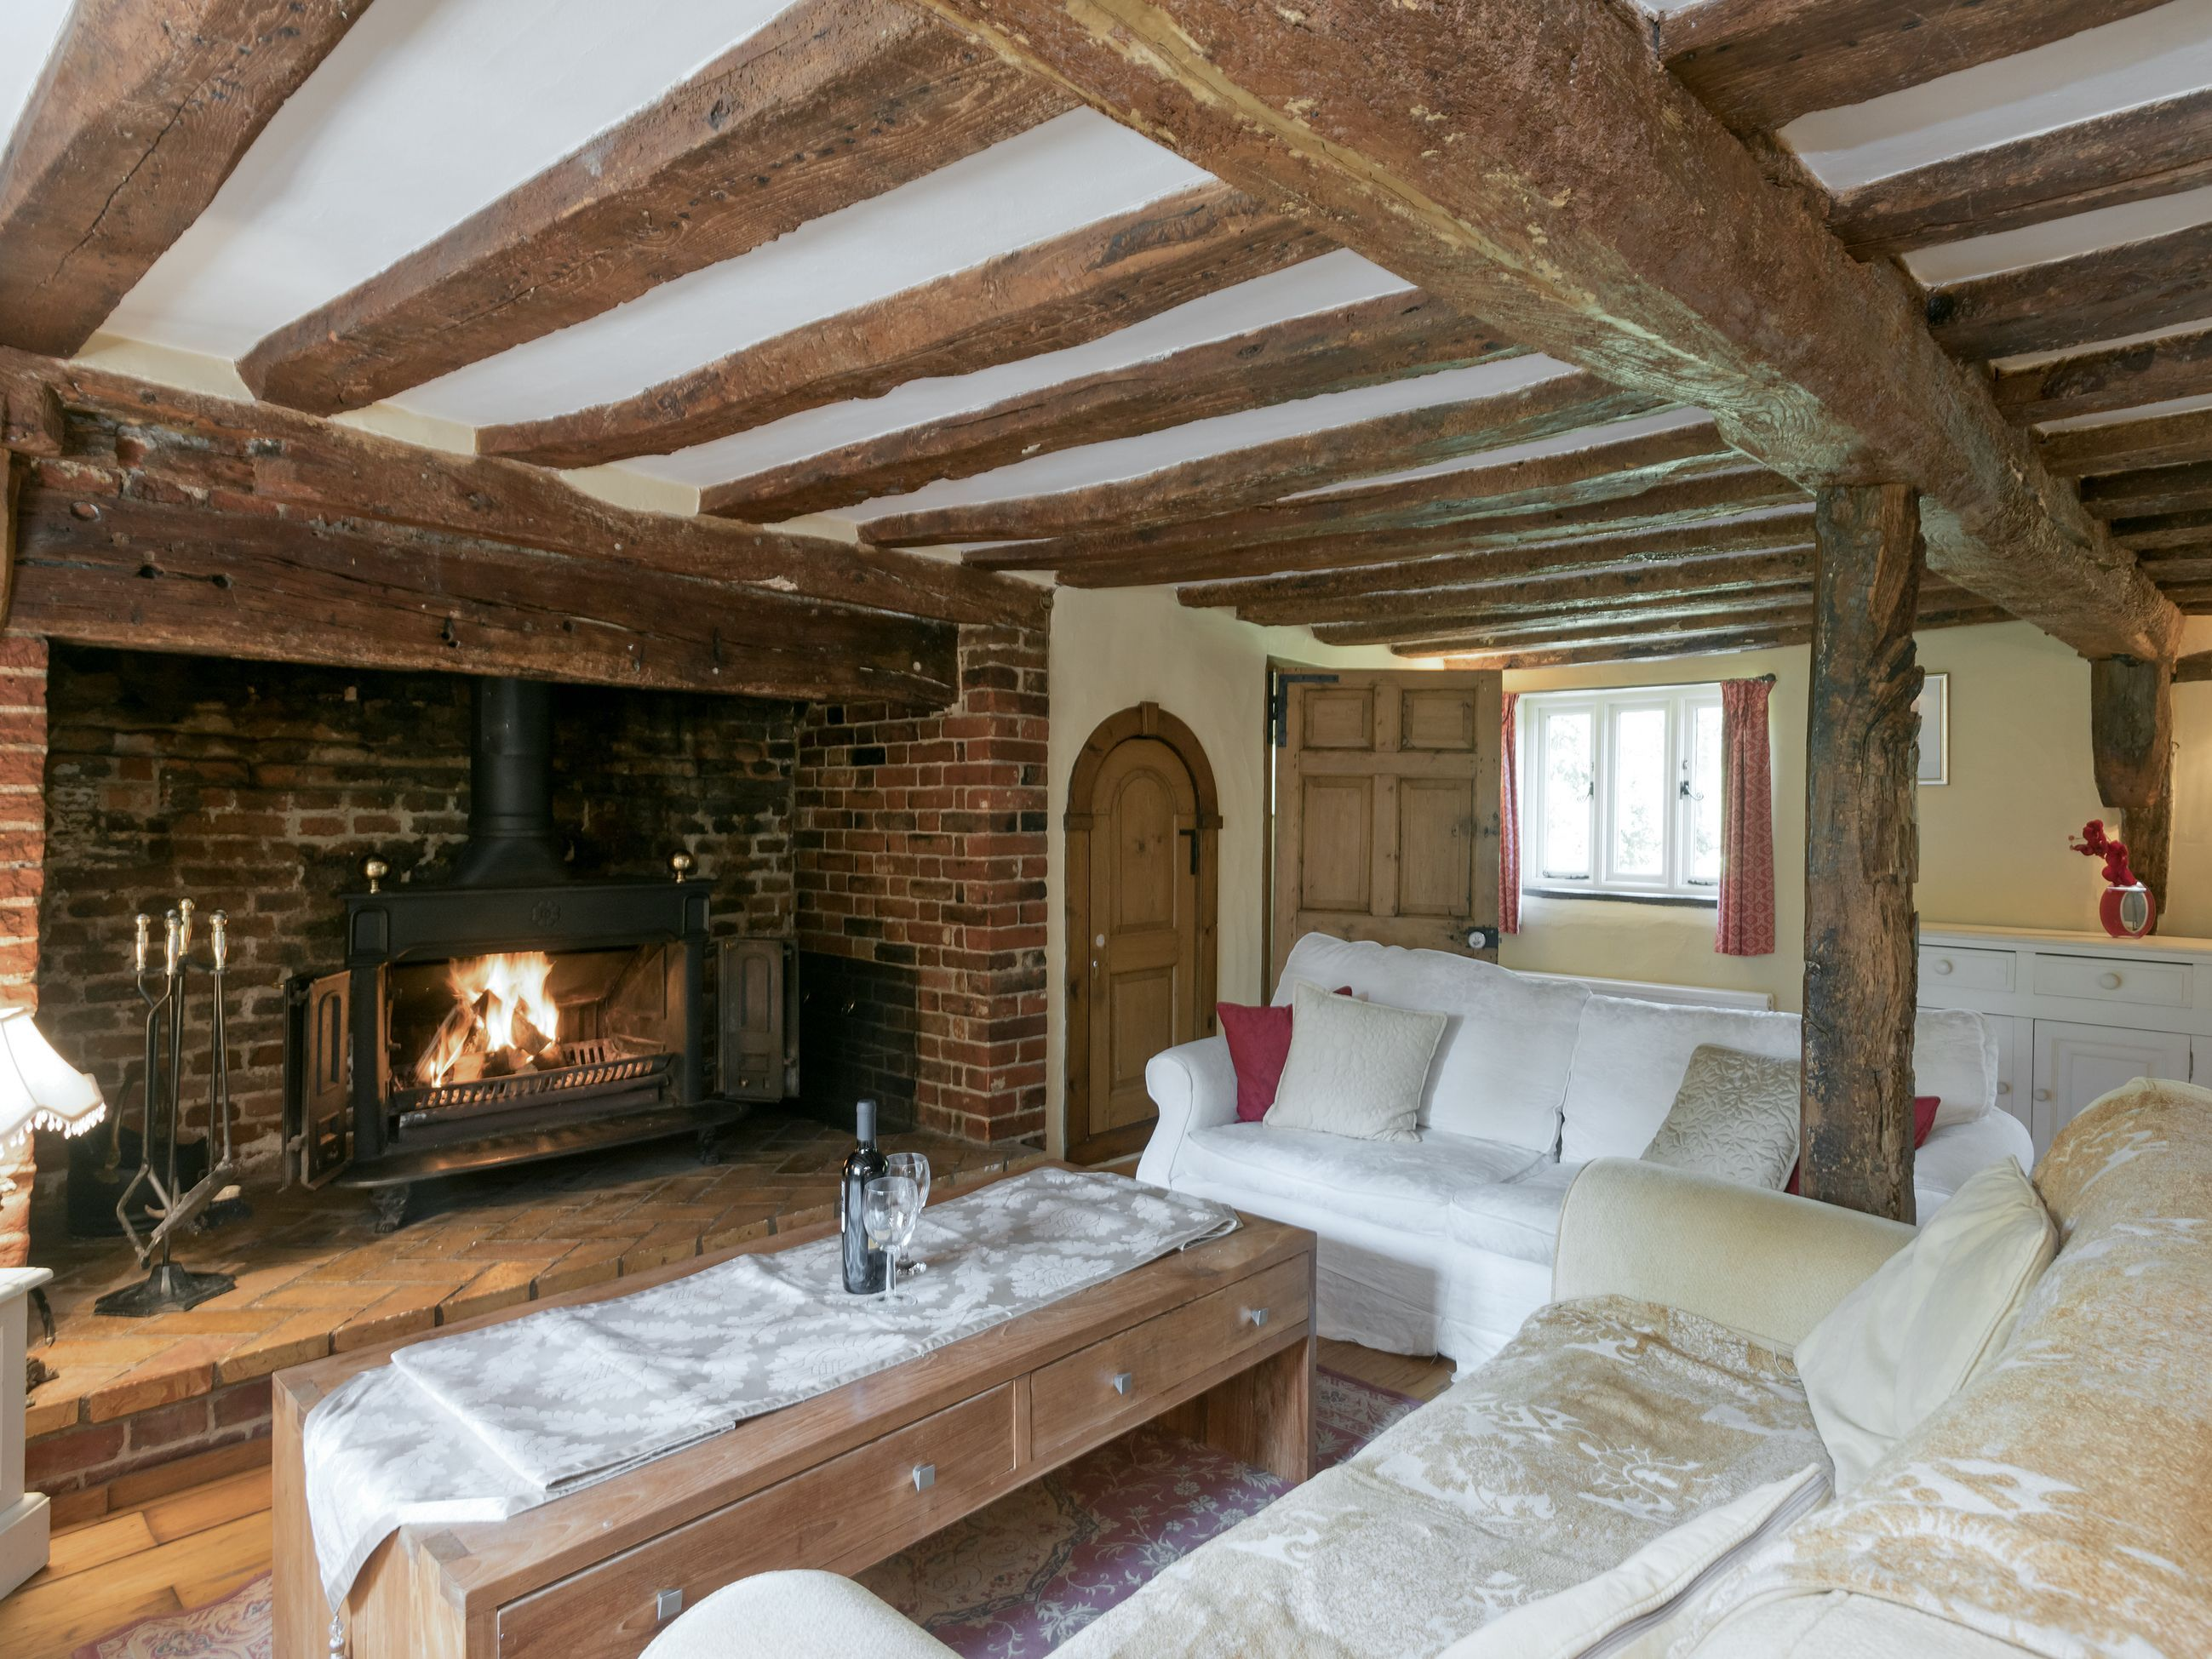 Image Result For Renovate Old Inglenook Cottage Interiors